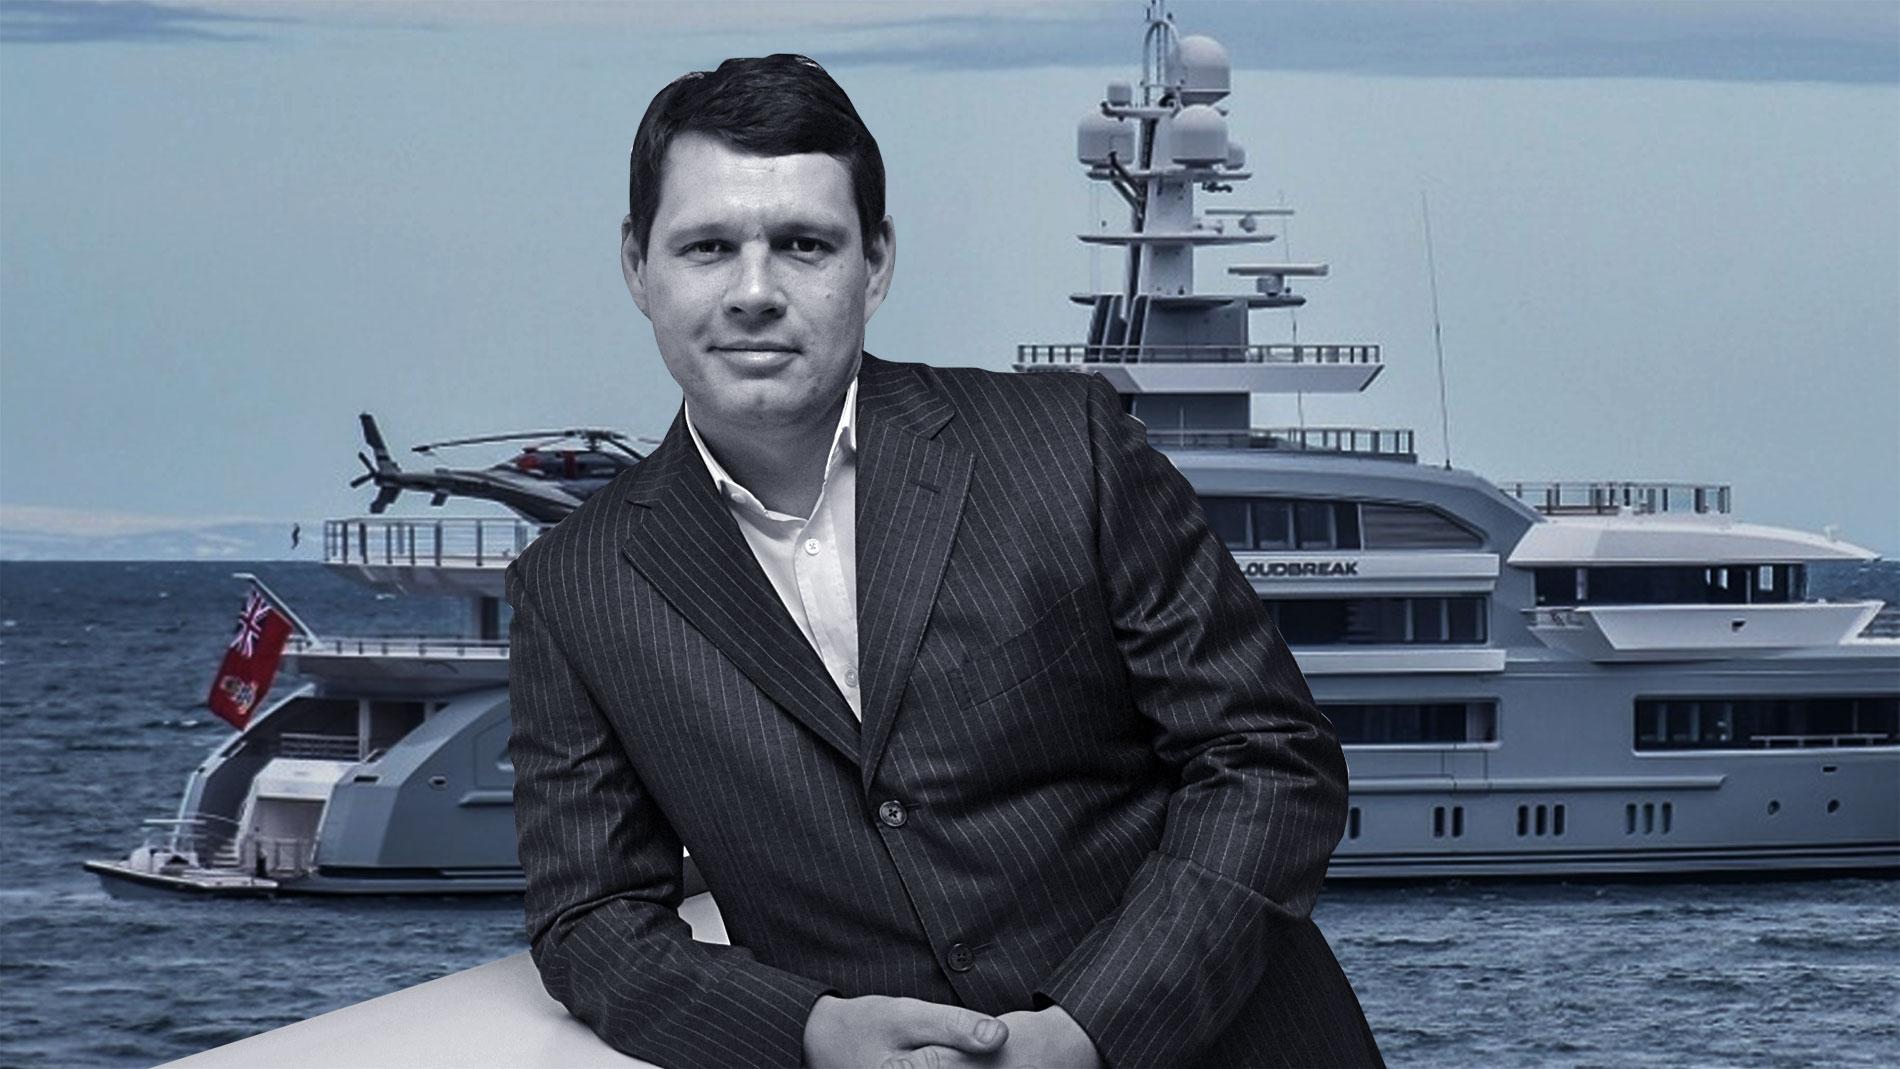 "<p>Александр Светаков. Фото © <a href=""https://www.superyachtfan.com/yacht/cloudbreak/photos/"" target=""_blank"" rel=""noopener noreferrer"">Superyachtfan.com</a>, ТАСС / Борис Кавашкин</p>"